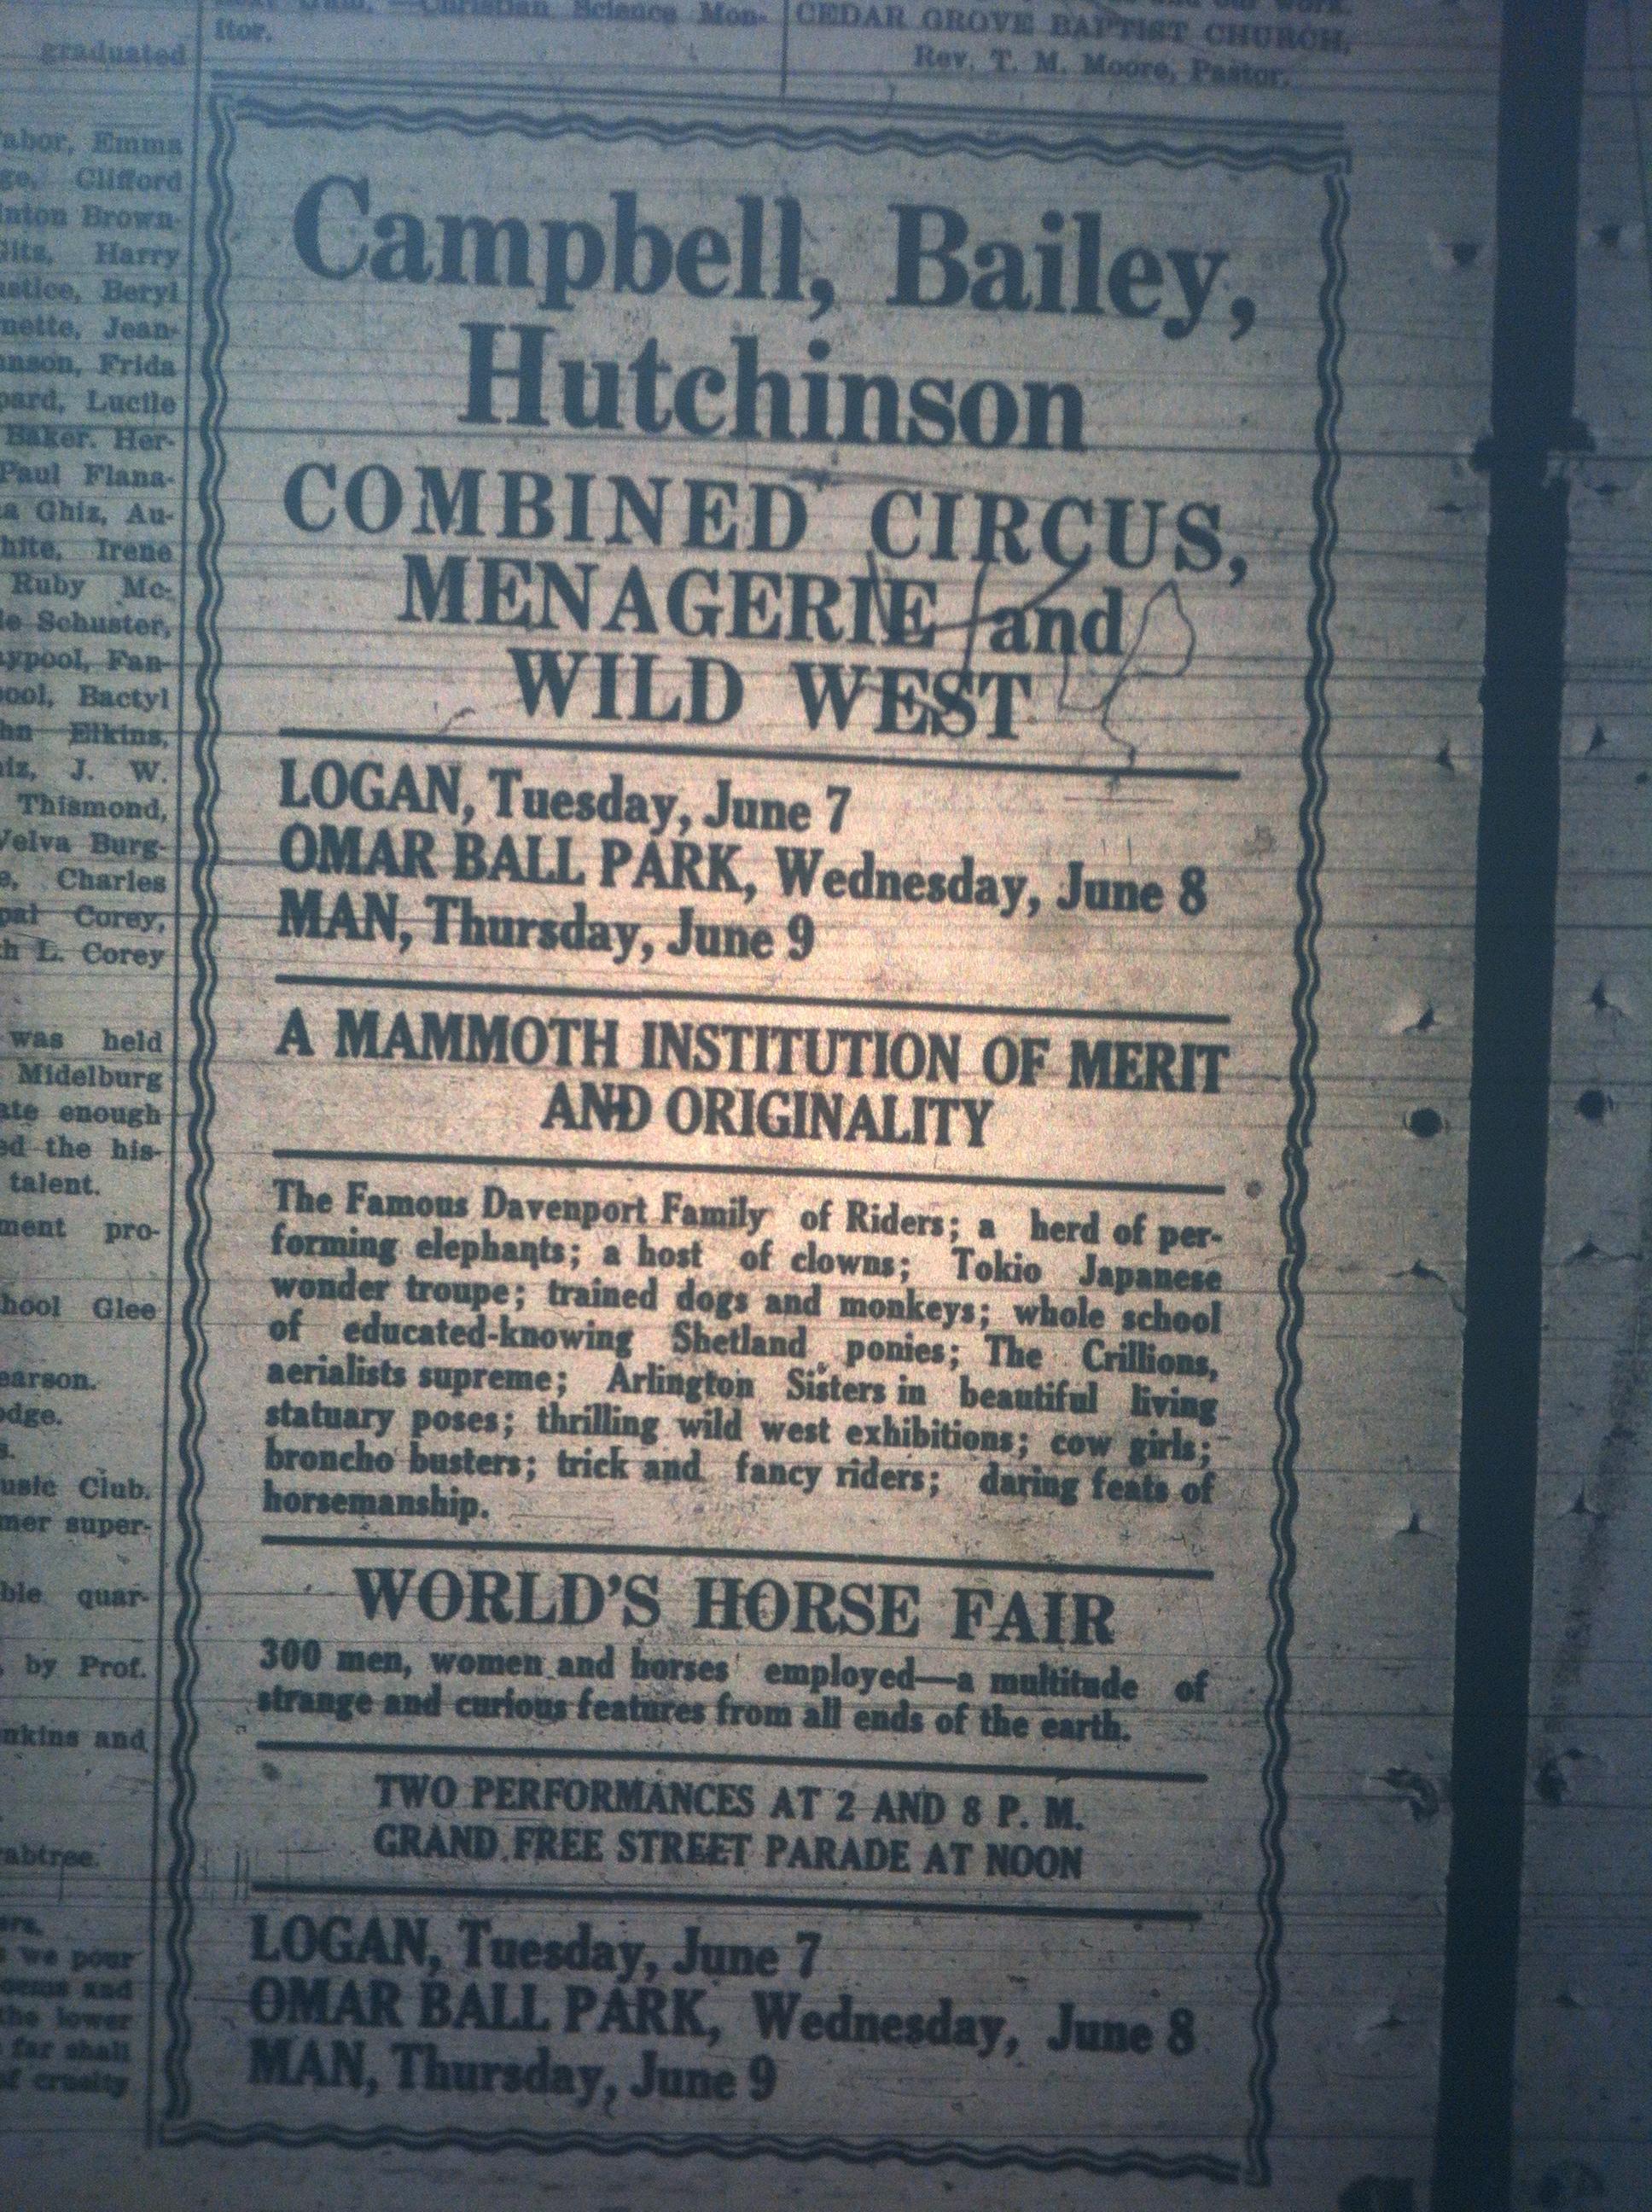 Campbell Bailey Hutchinson Circus Ad LB 05.27.1921.JPG